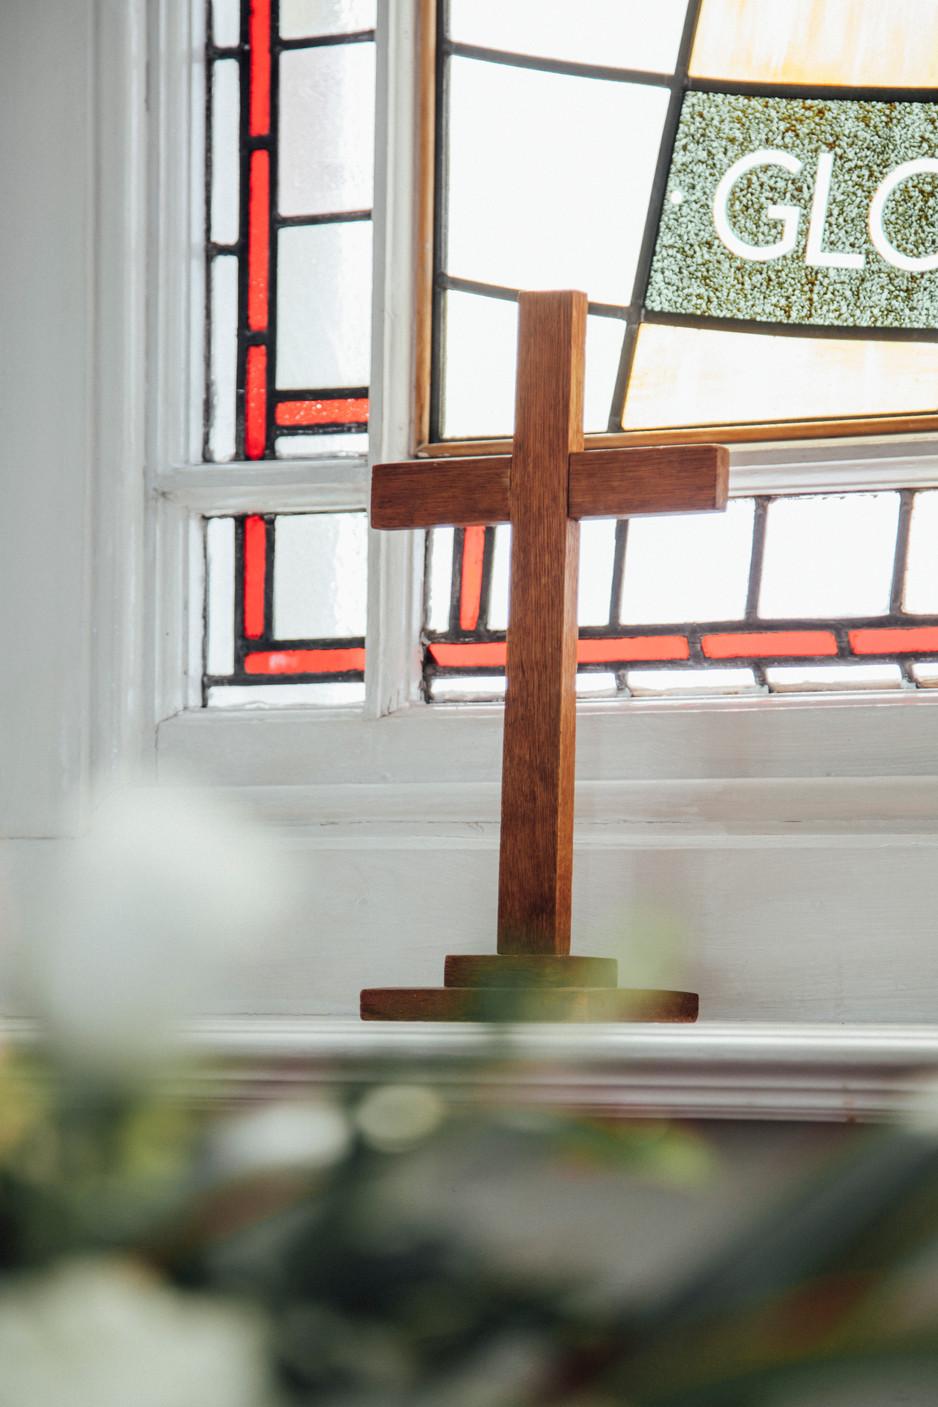 linldey gledholt methodist church